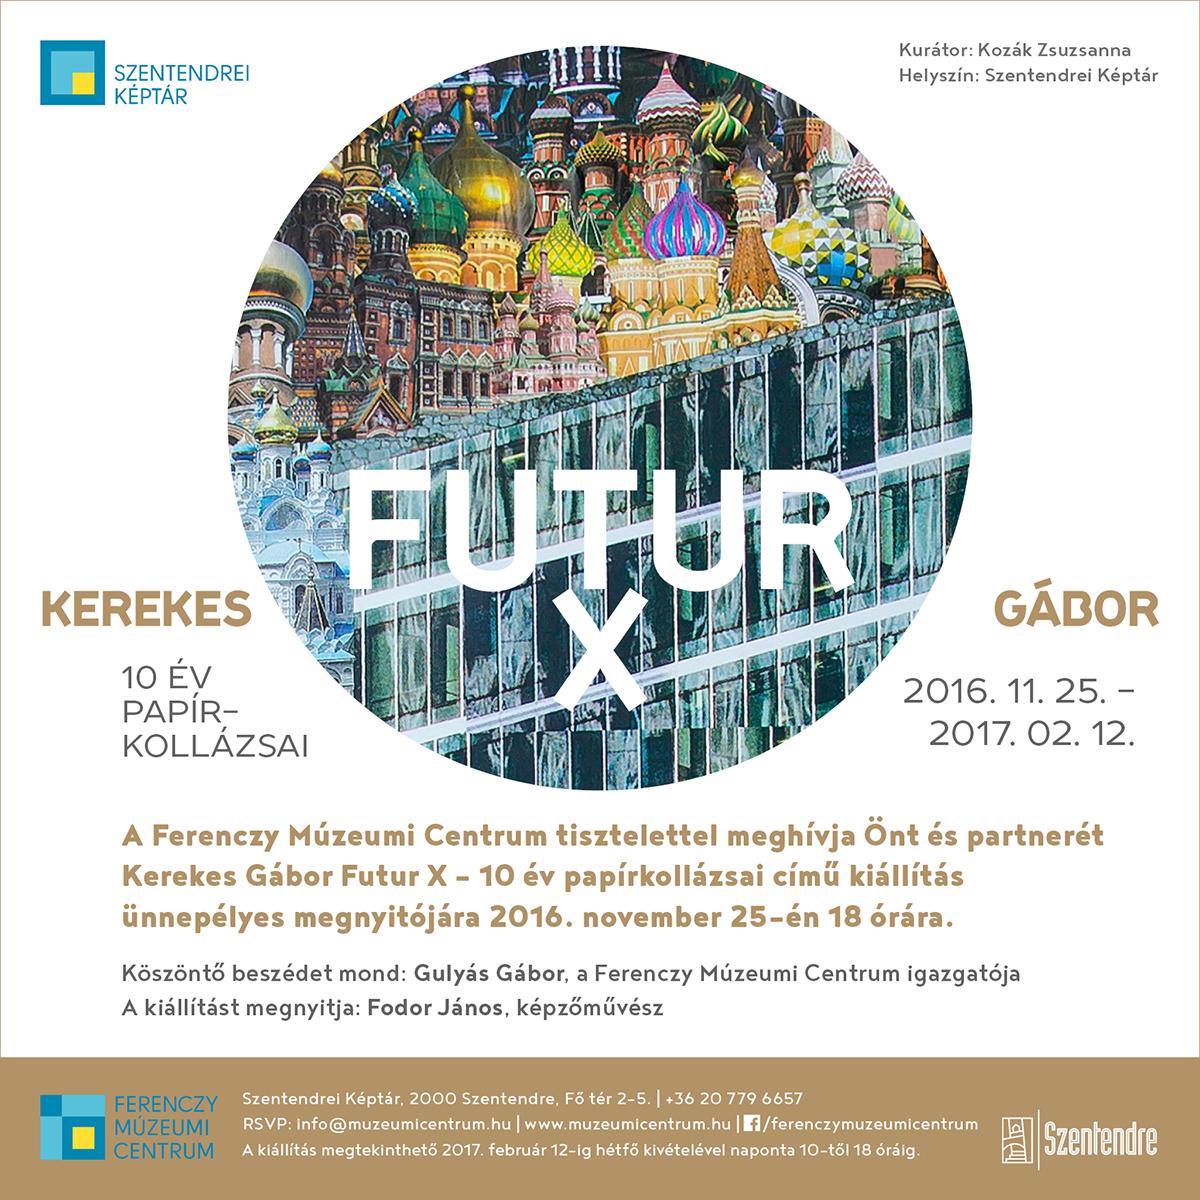 Kerekes_Gabor_FUTUR_X_meghivo